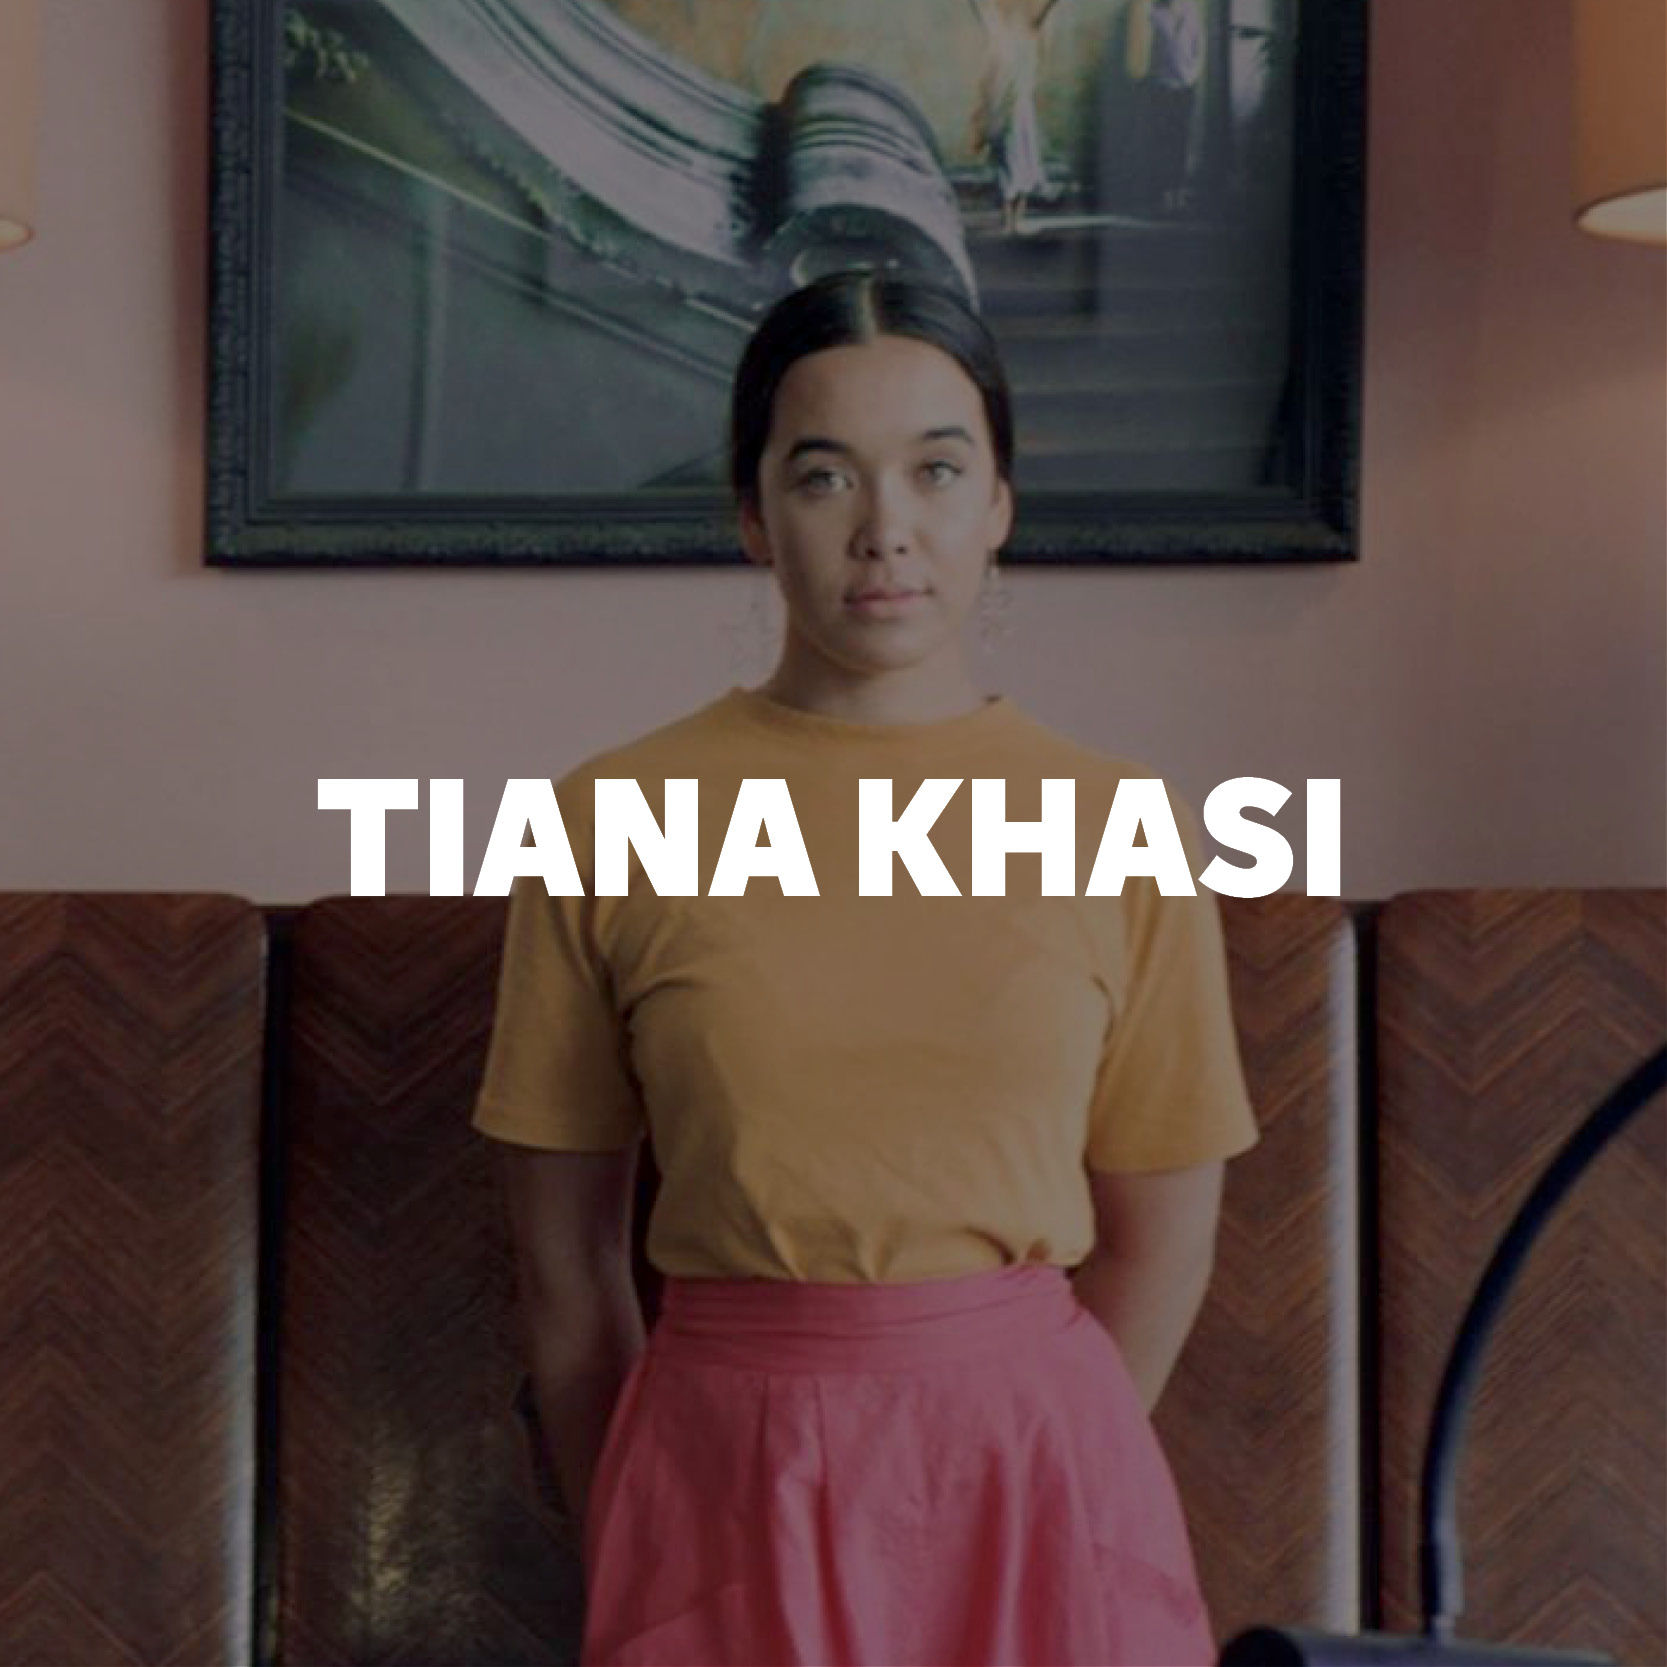 TIANA KHASI